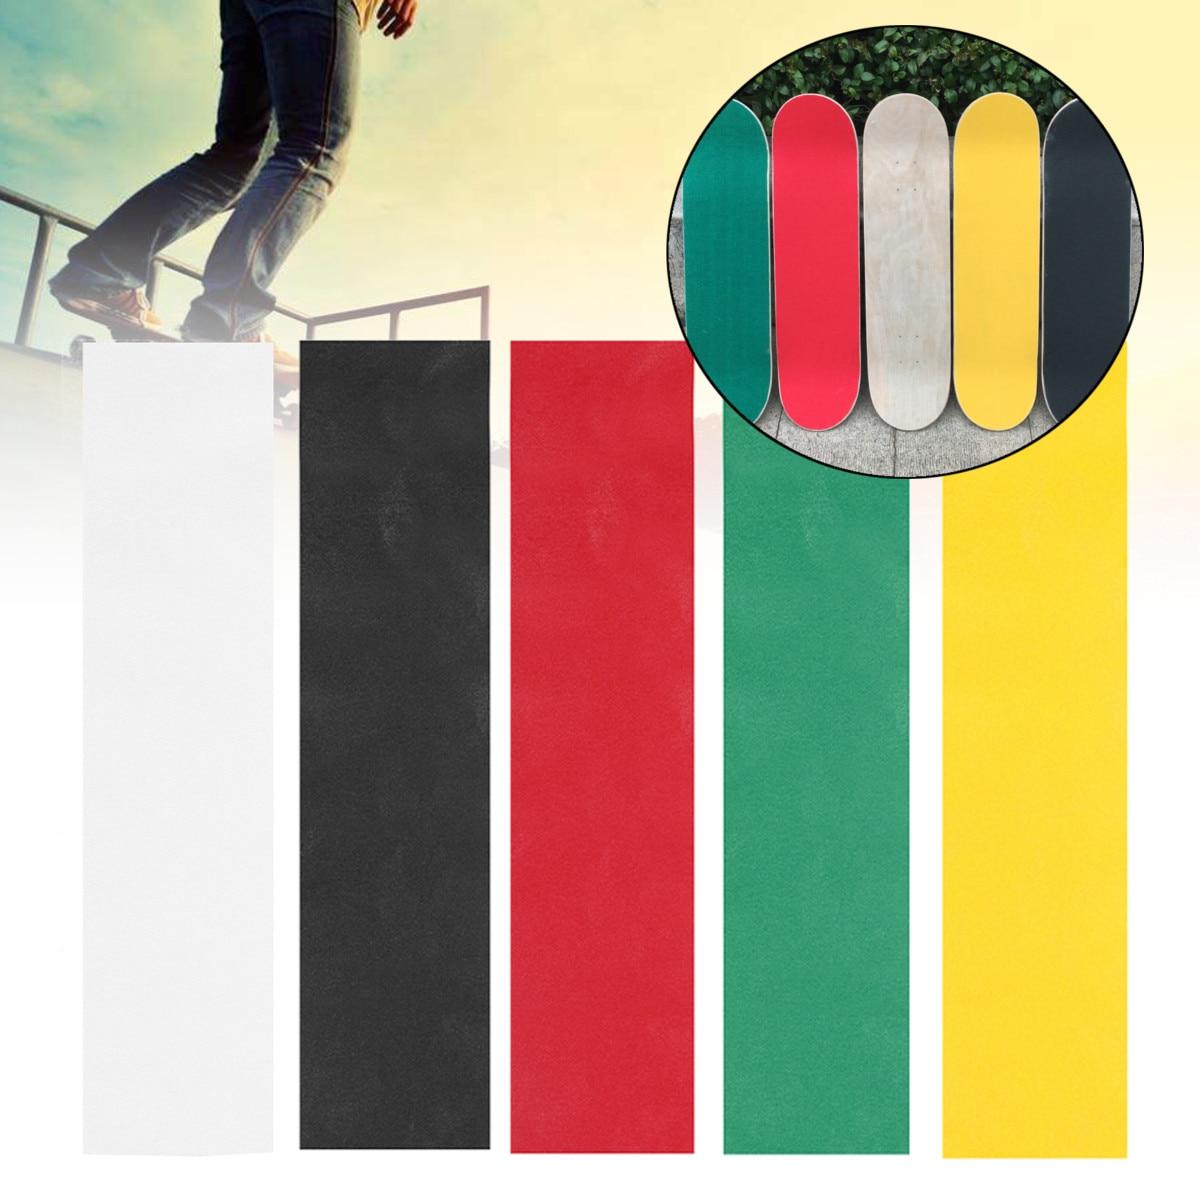 Longboarding Skating-Board Sticker Professional Skateboard Deck Sandpaper Grip Tape Griptape Skating Board Sticker